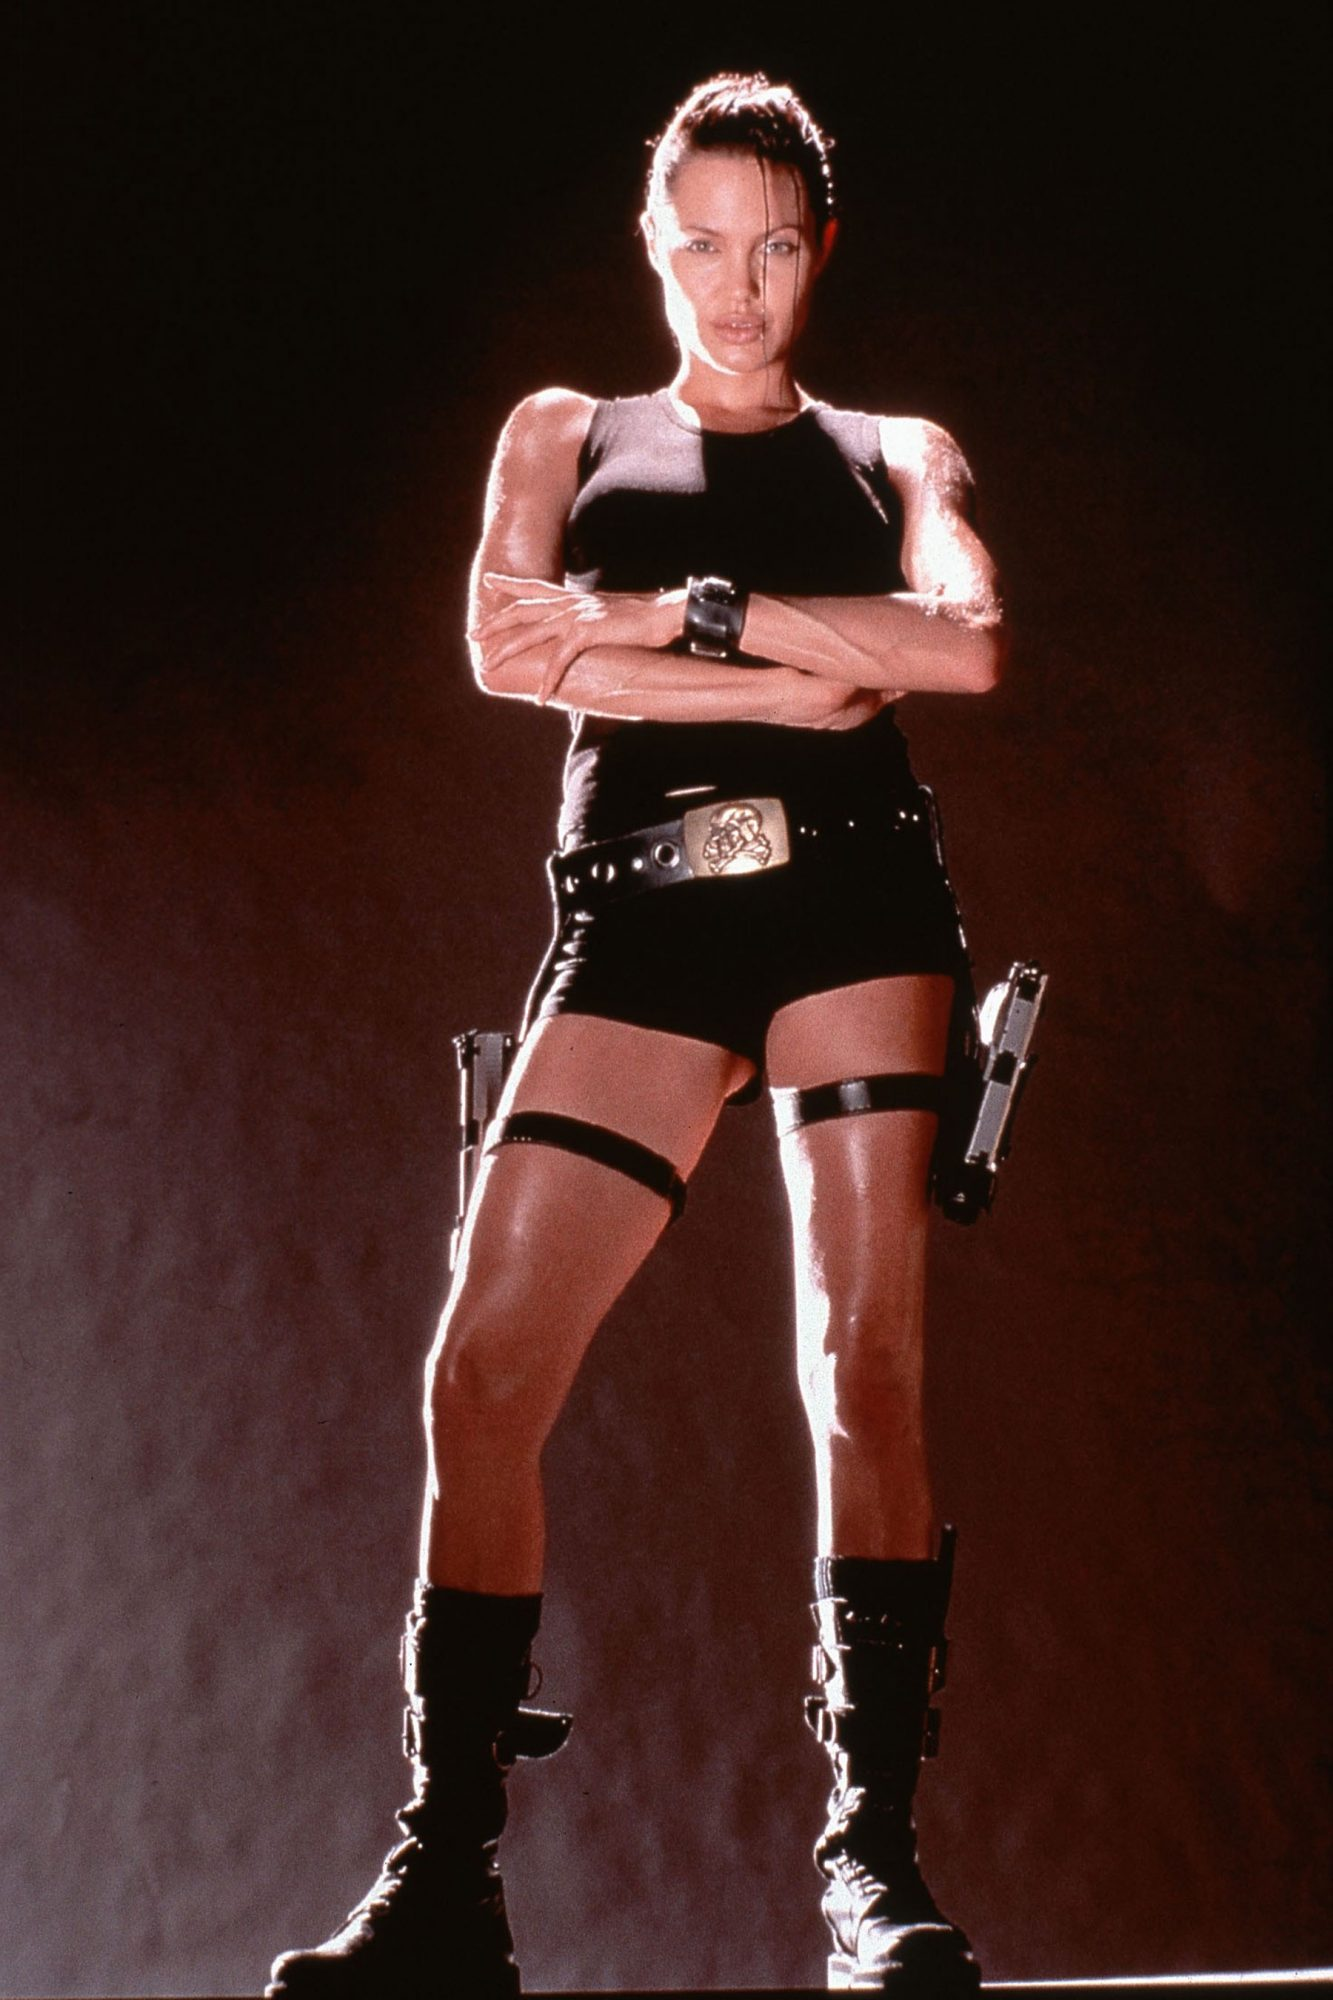 LARA CROFT: TOMB RAIDER (US/BR/GER/JAP 2001) ANGELINA JOLIE